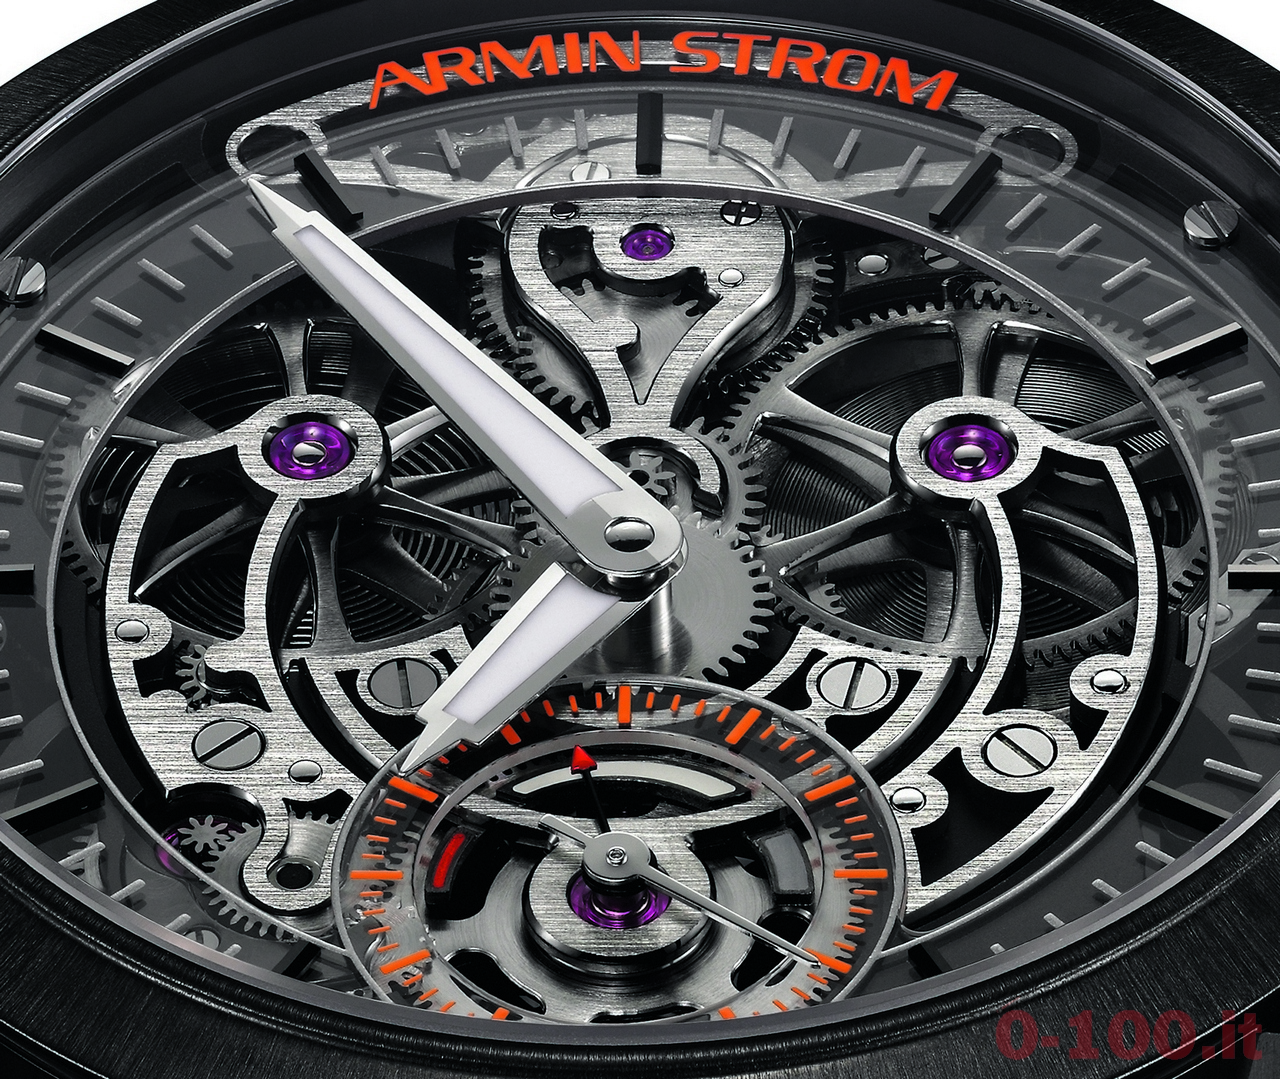 anteprima-baselworld-2015-armin-strom-skeleton-pure-earth-limited-edition_0-100_3